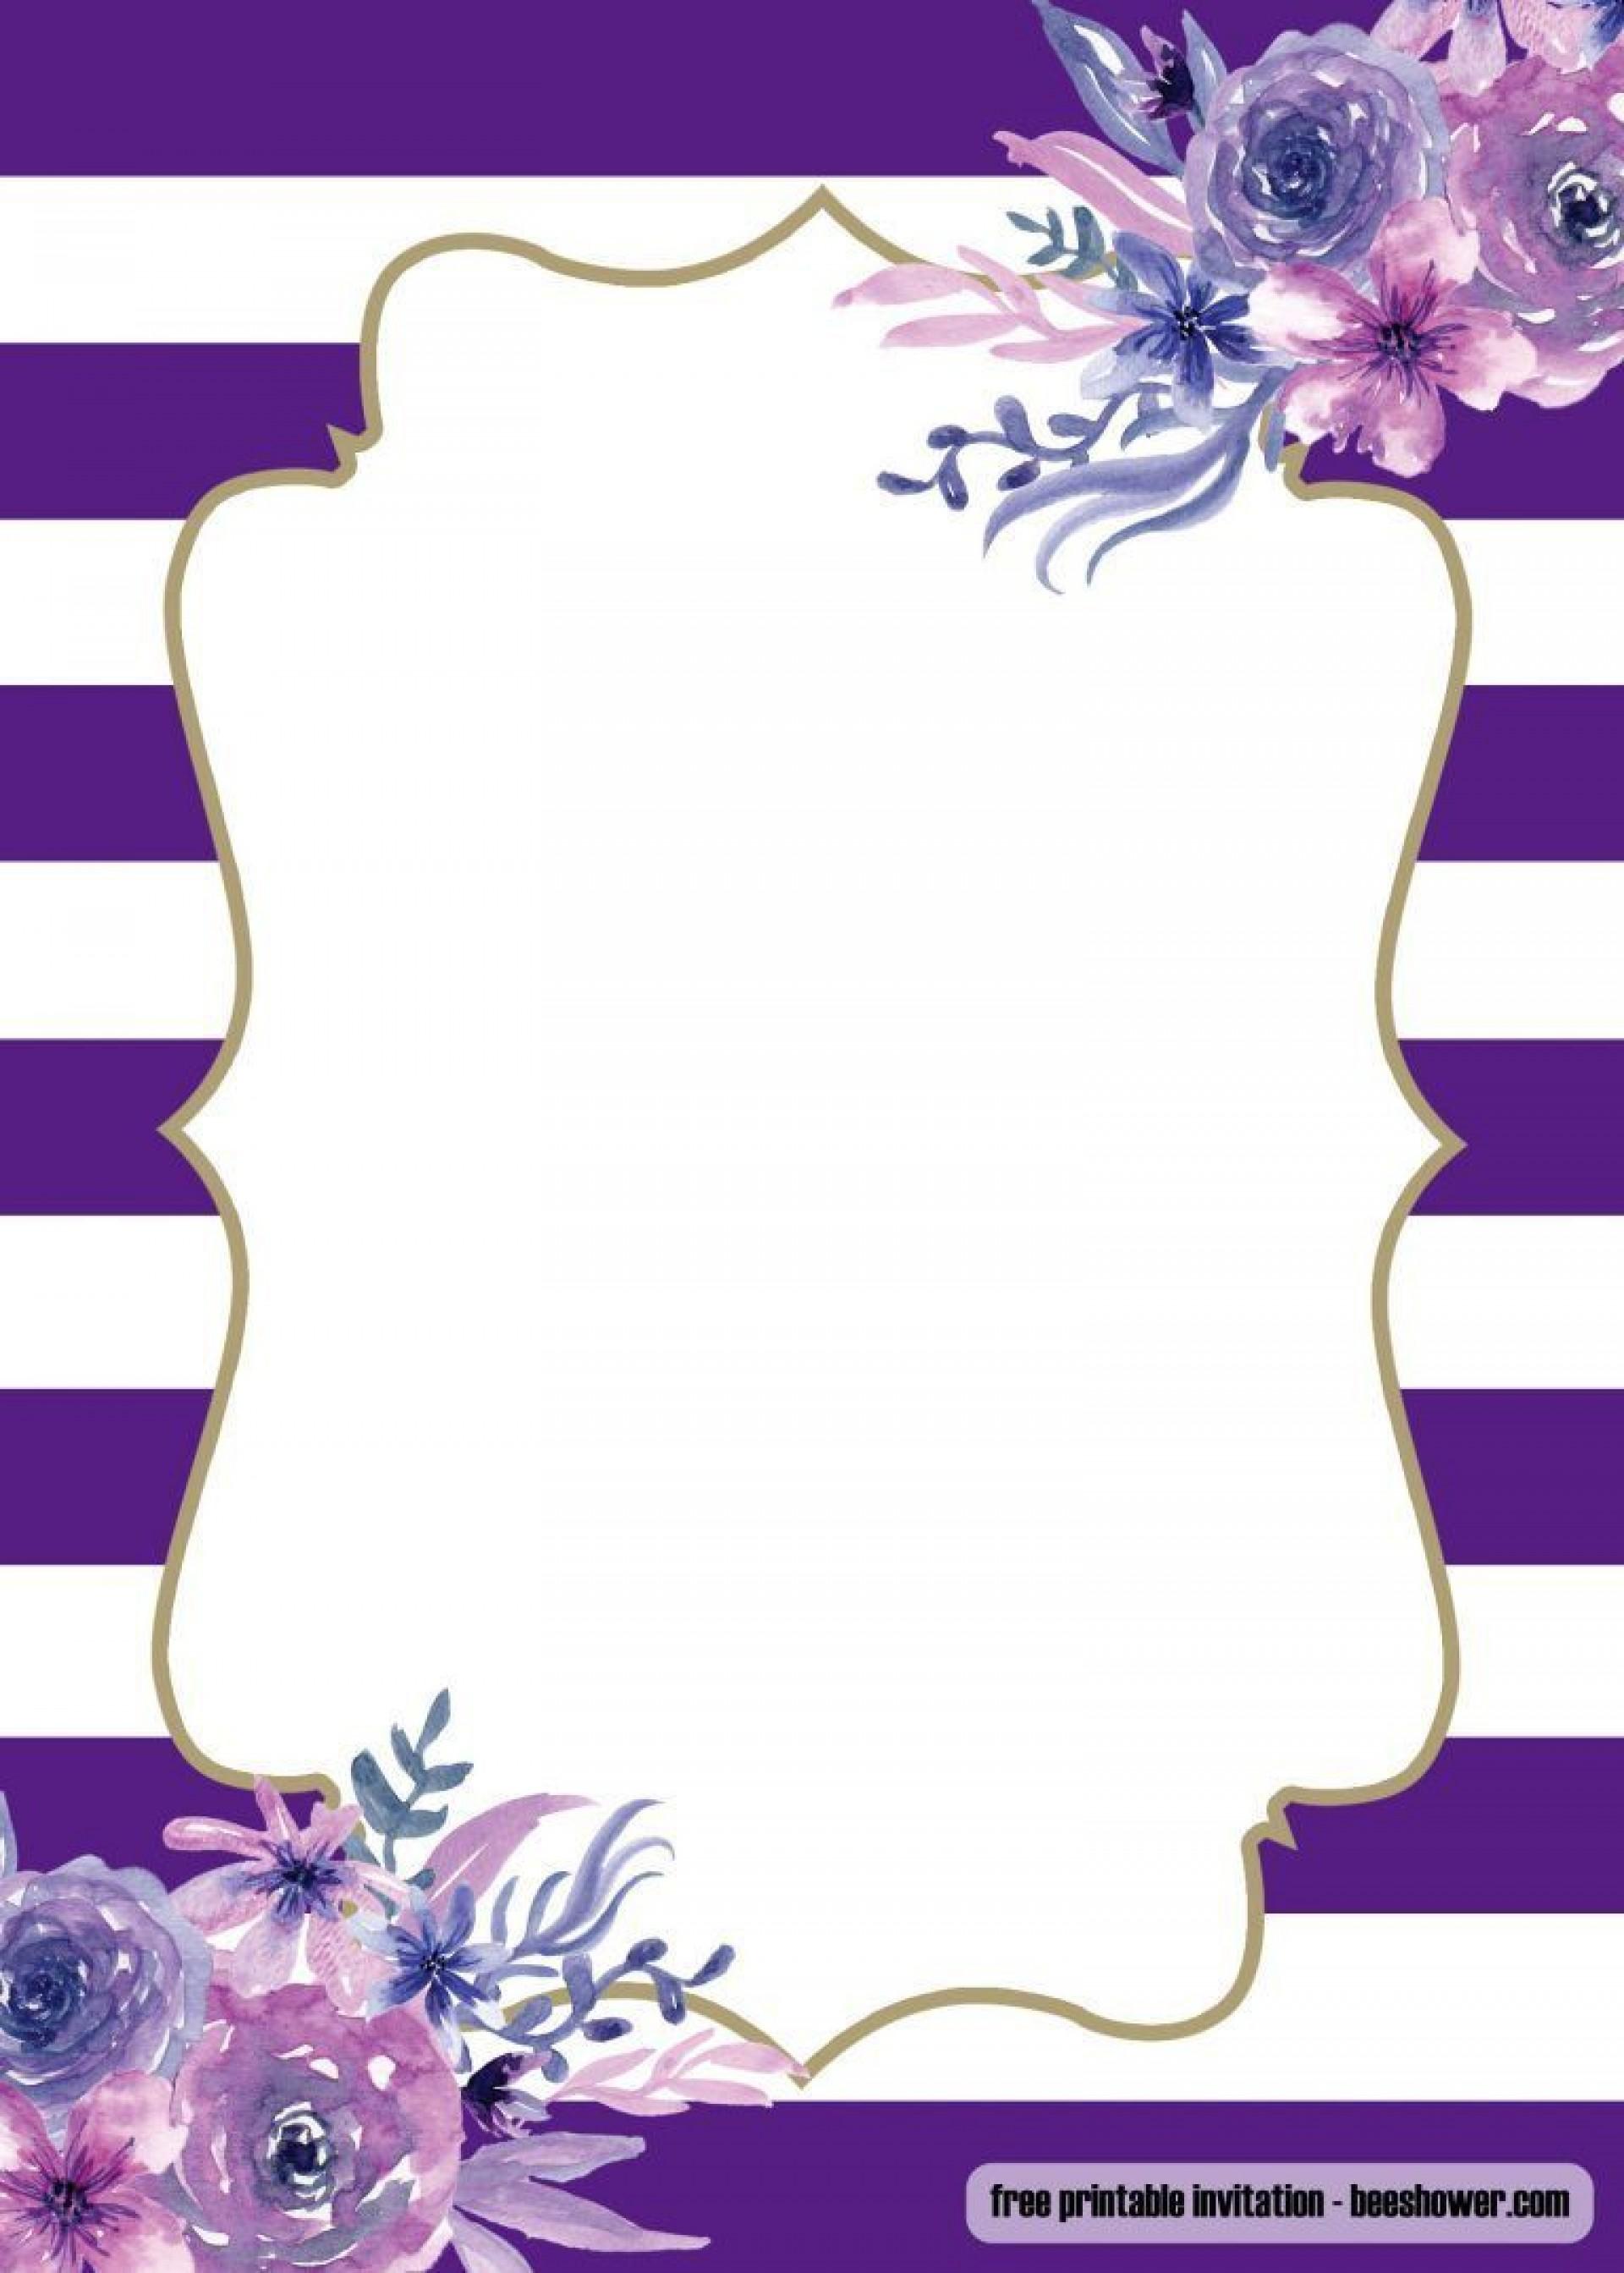 005 Surprising Baby Shower Invitation Girl Purple High Def 1920